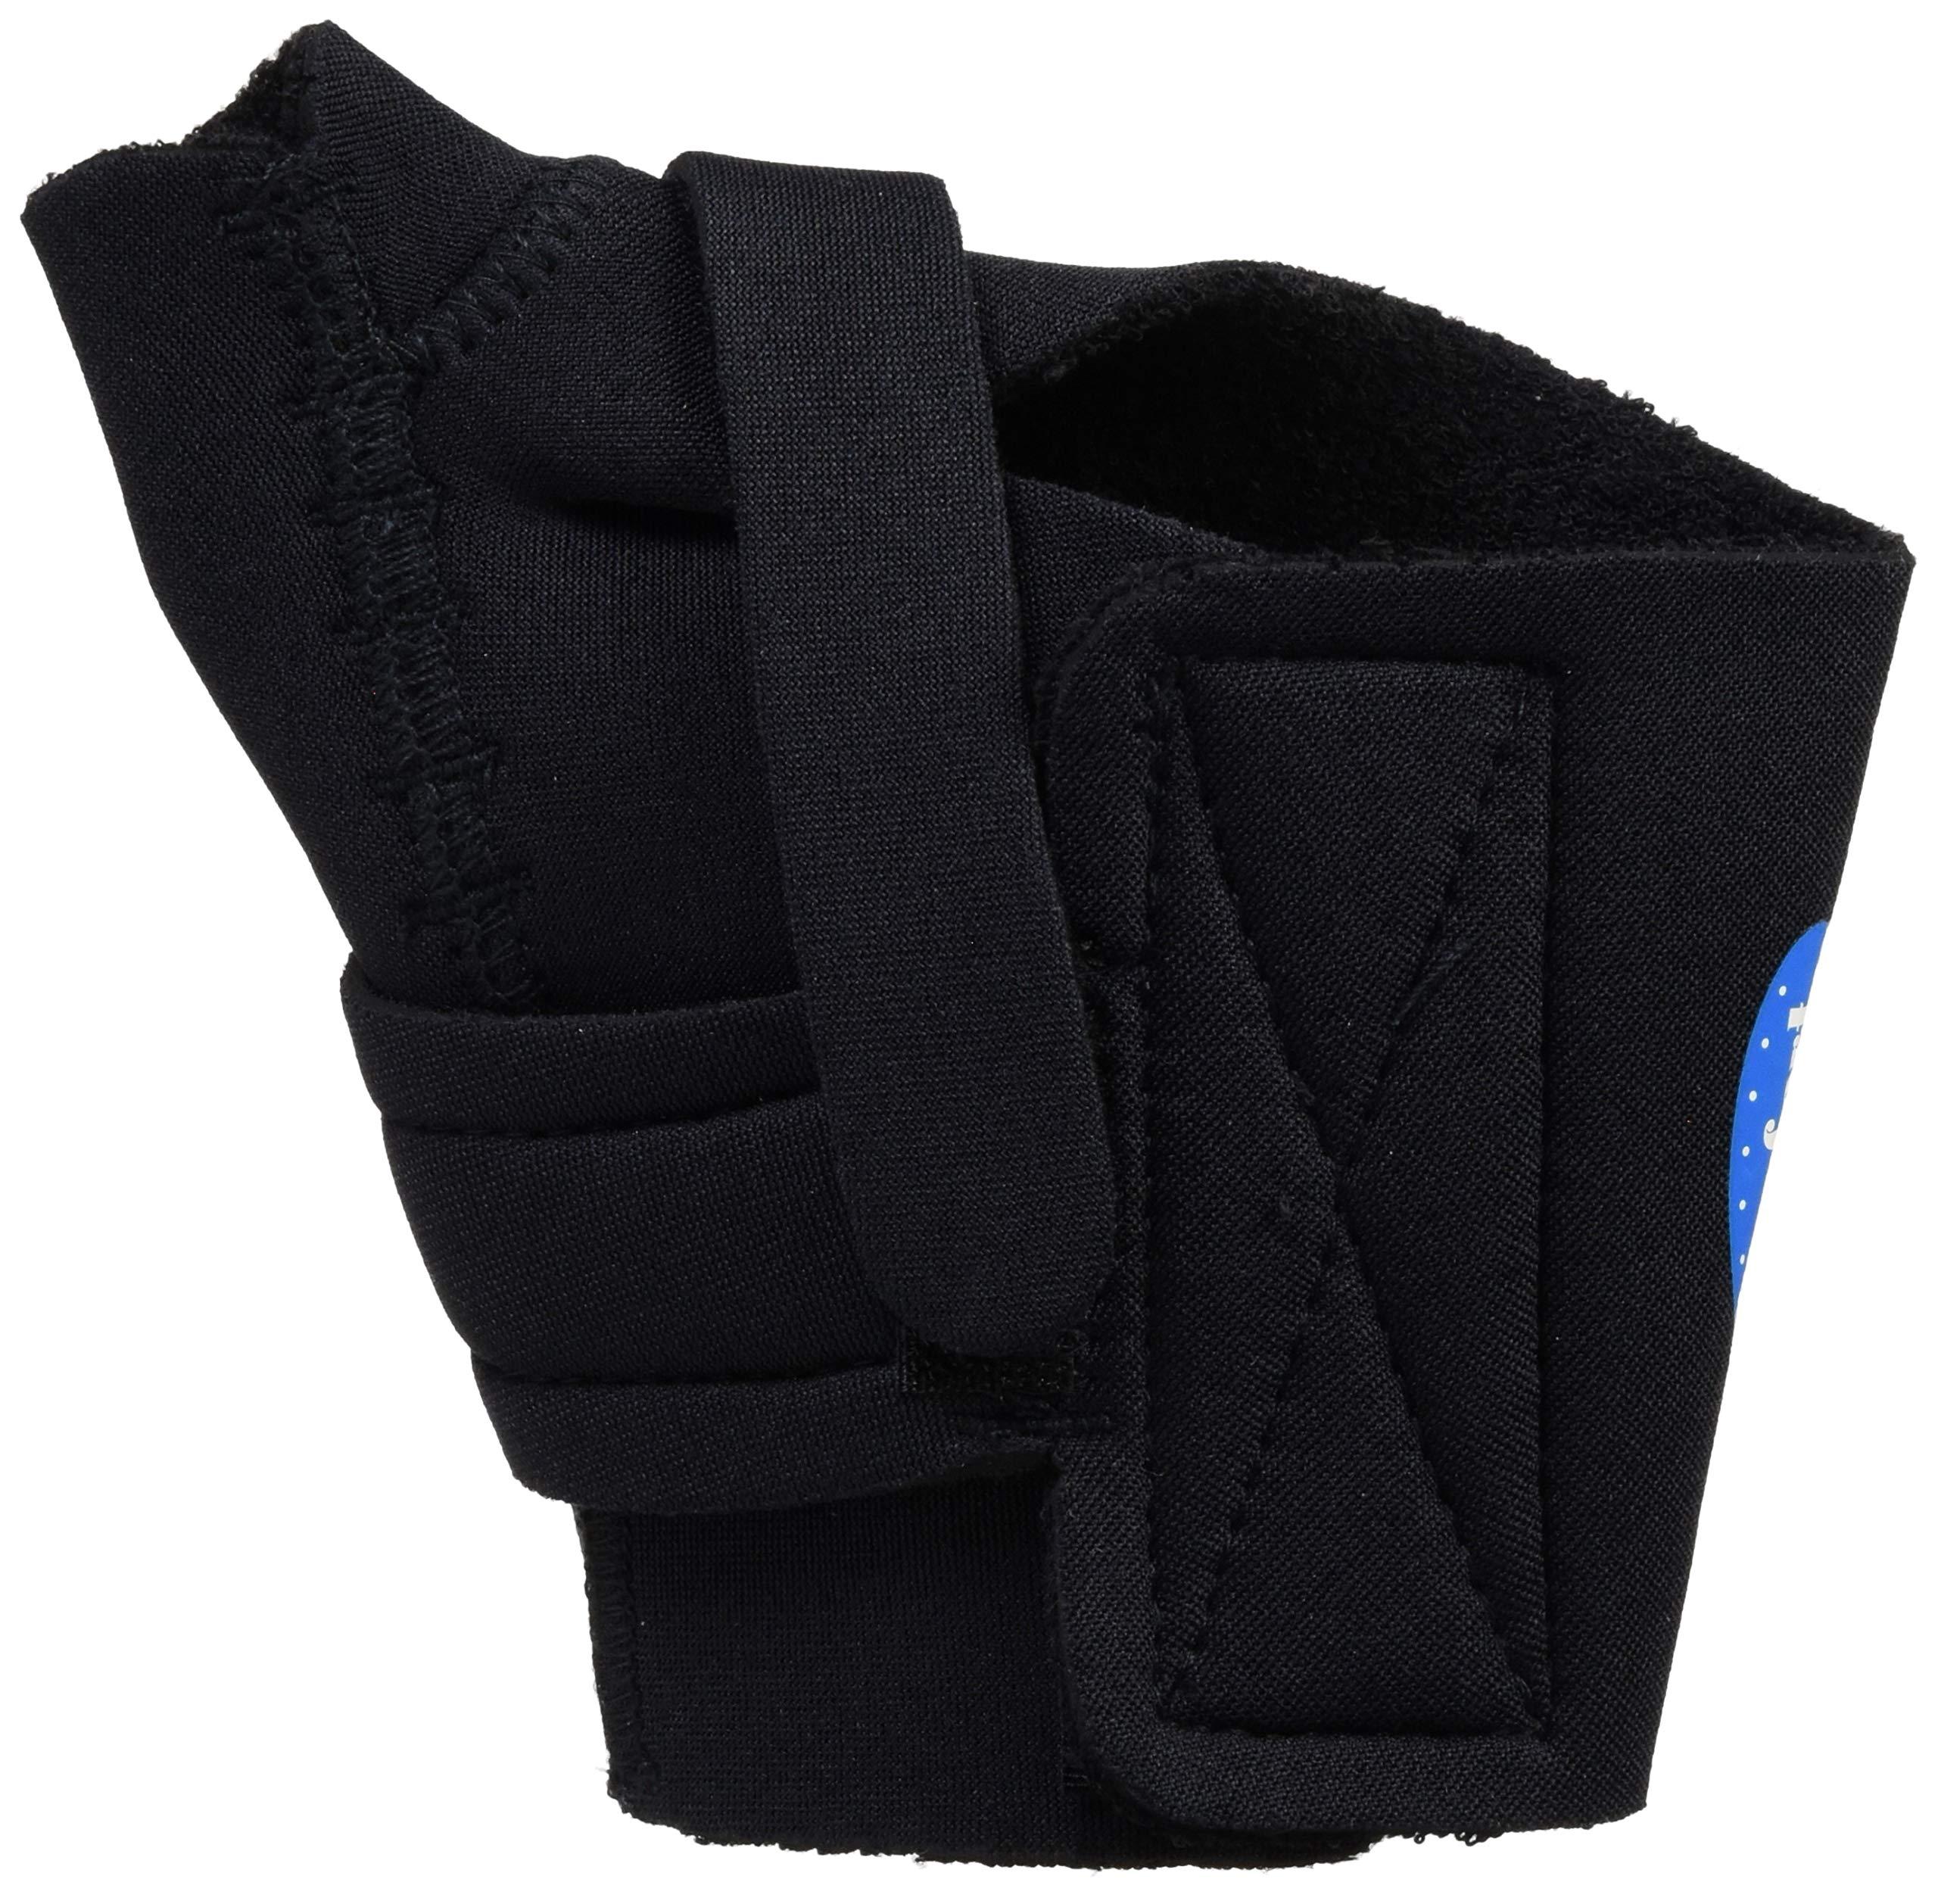 Amazon Com Comfort Cool Arthritis Thumb Splint Black Medium Right